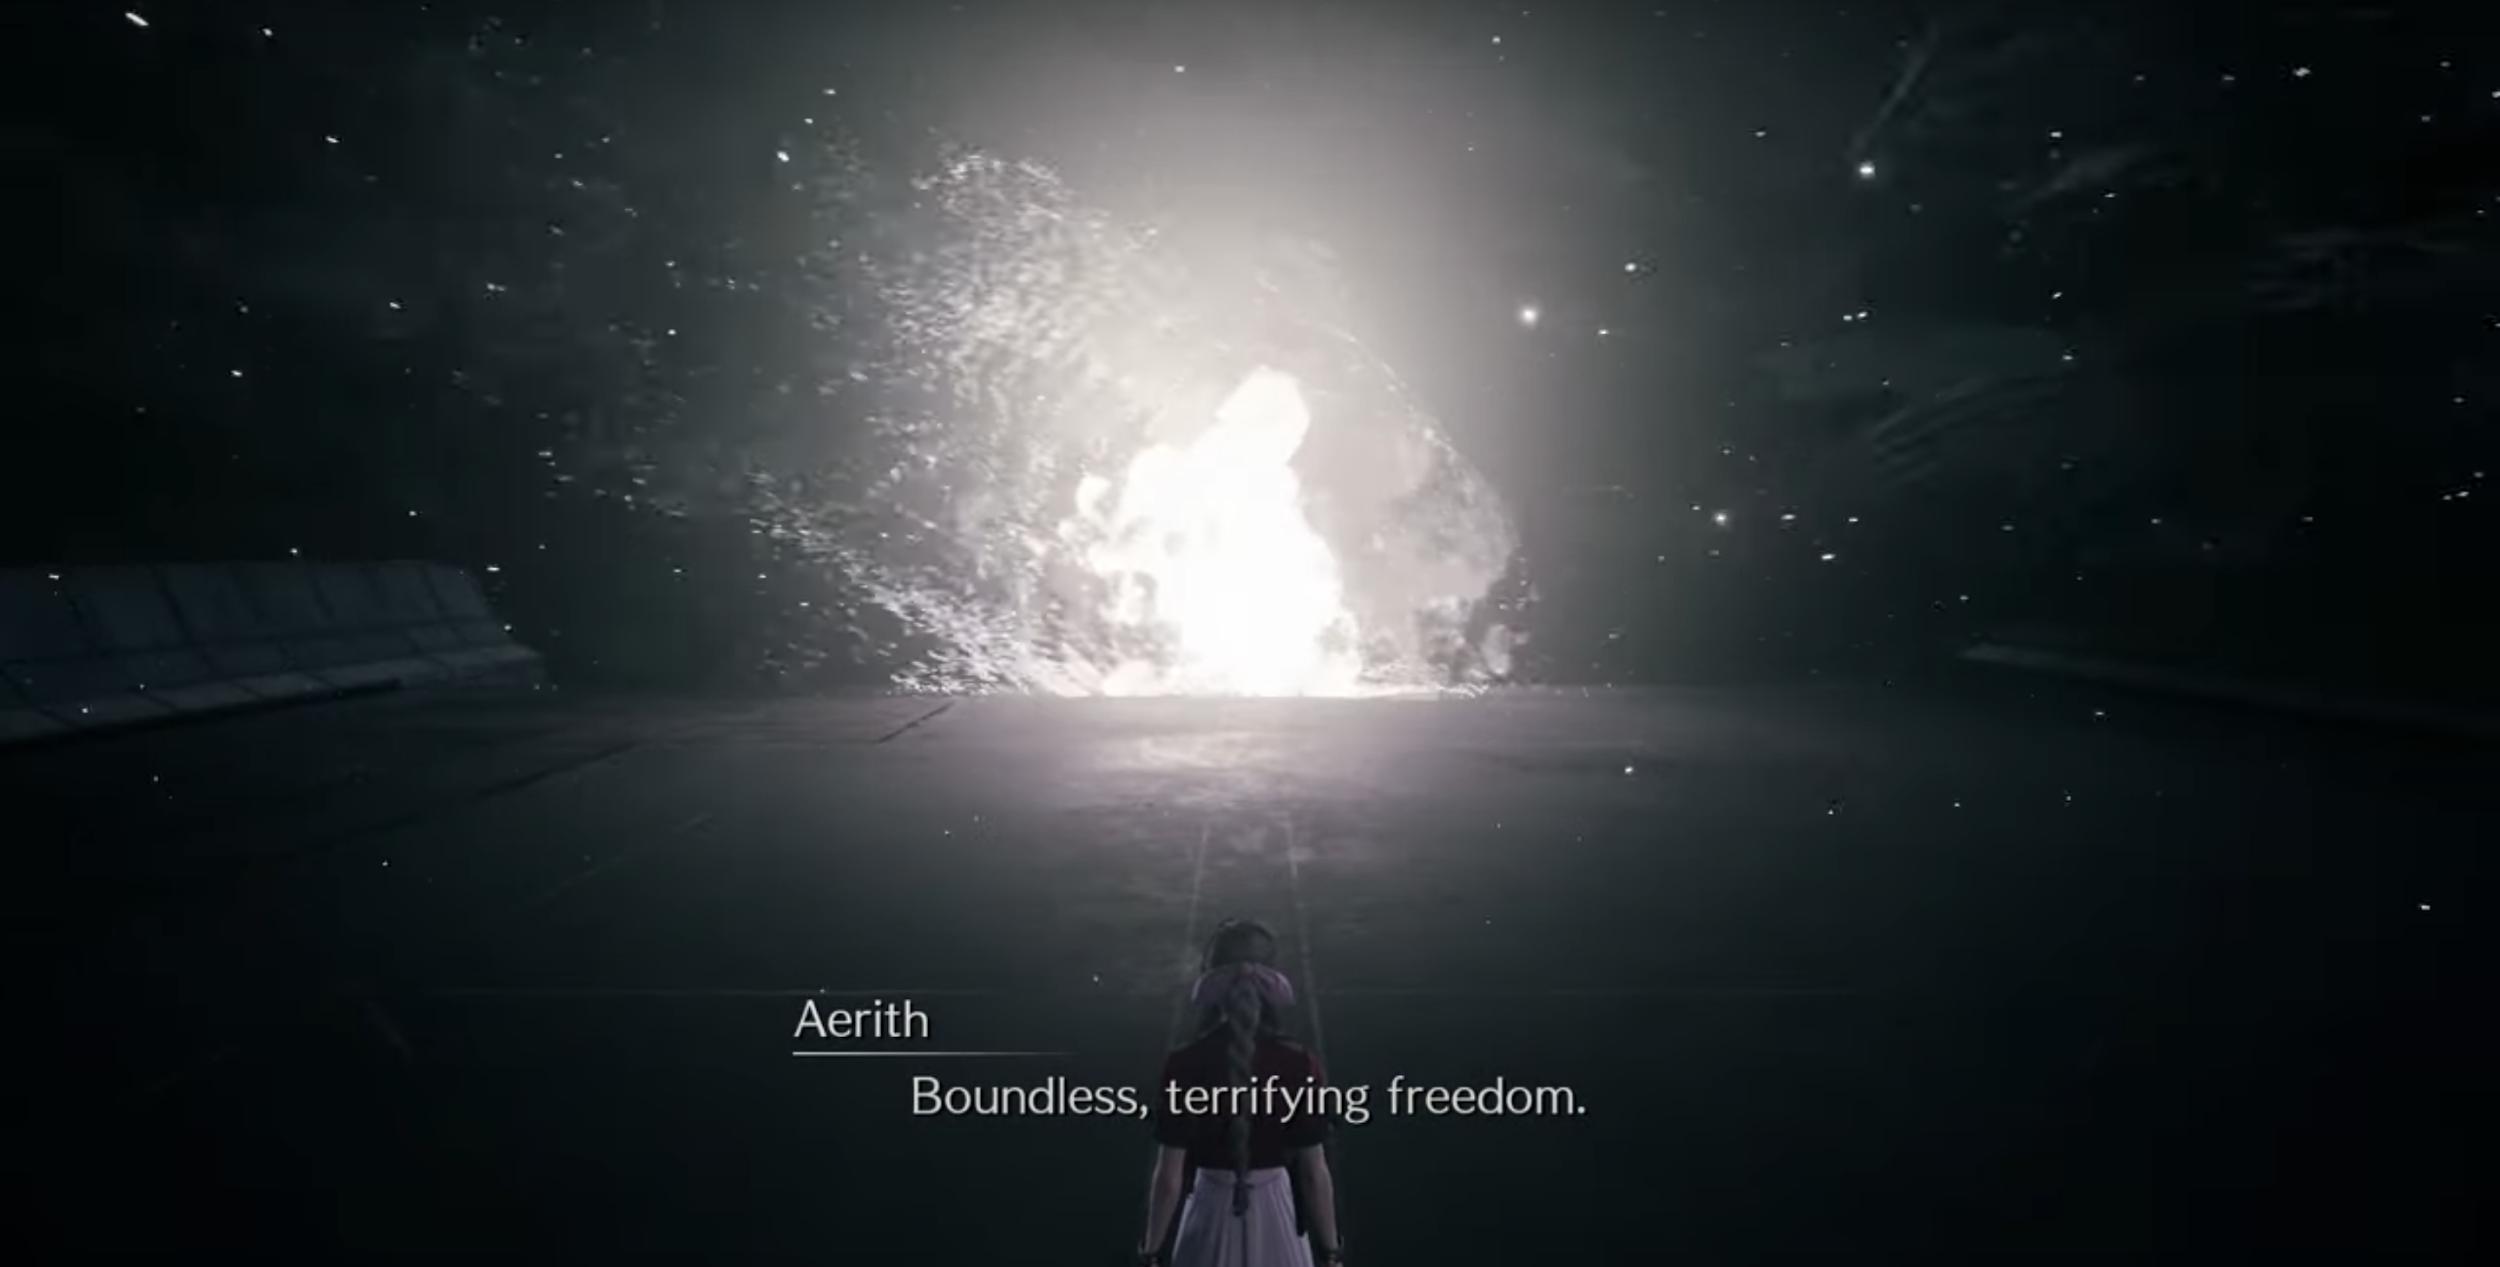 Aerith at Destiny's Crossroads